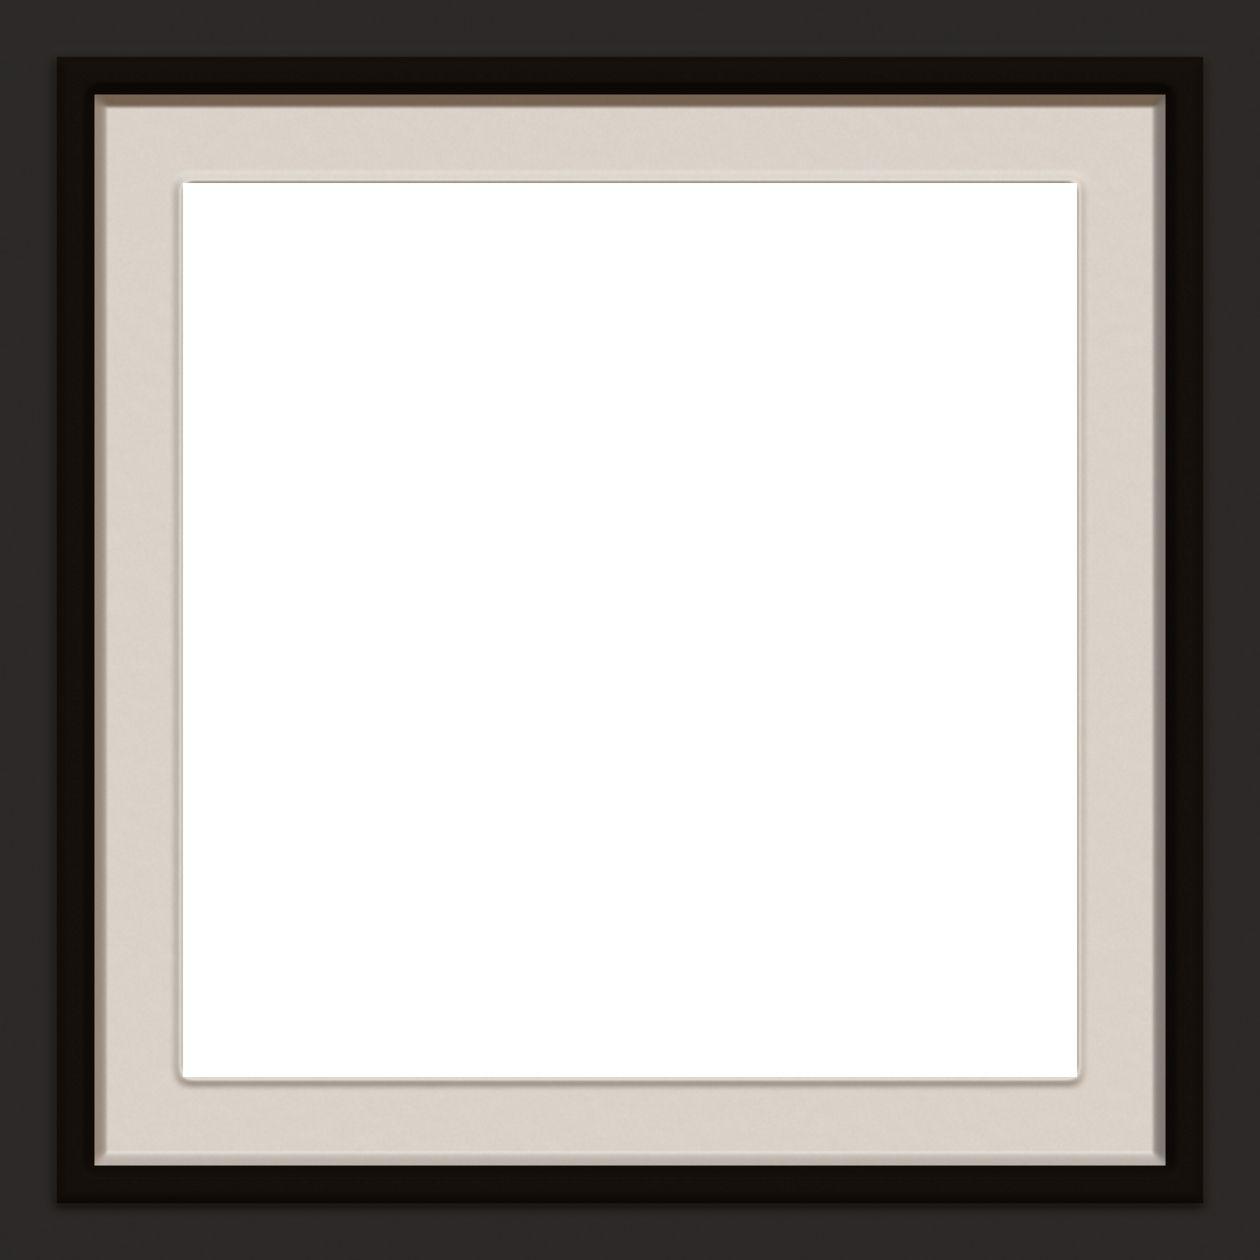 Marcos para cuadros - Hogar Total | marcos para cuadros | Pinterest